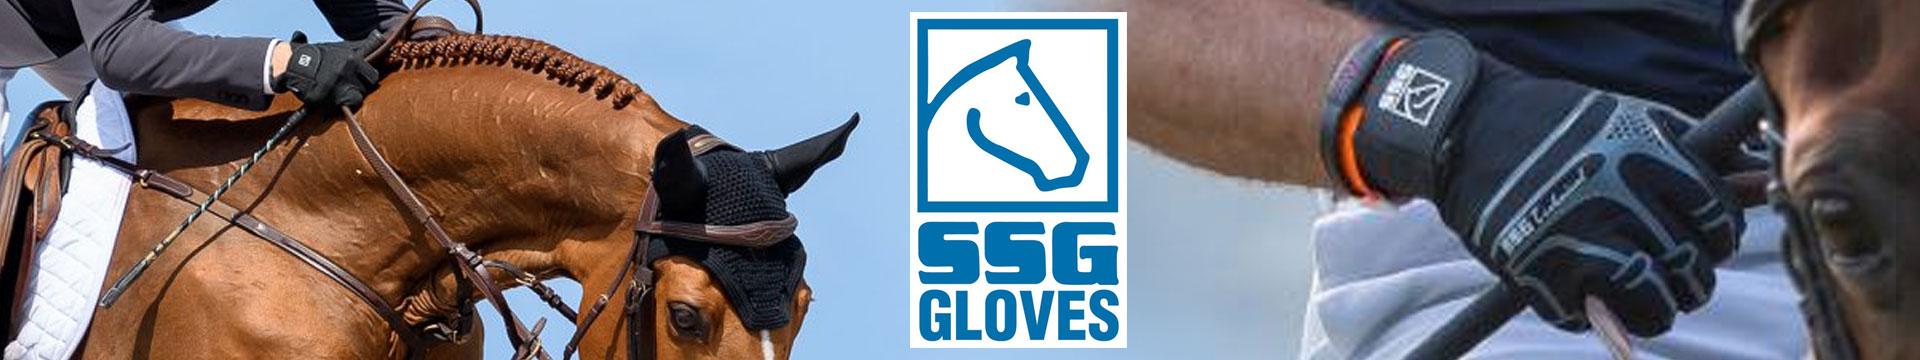 SSG Riding Gloves